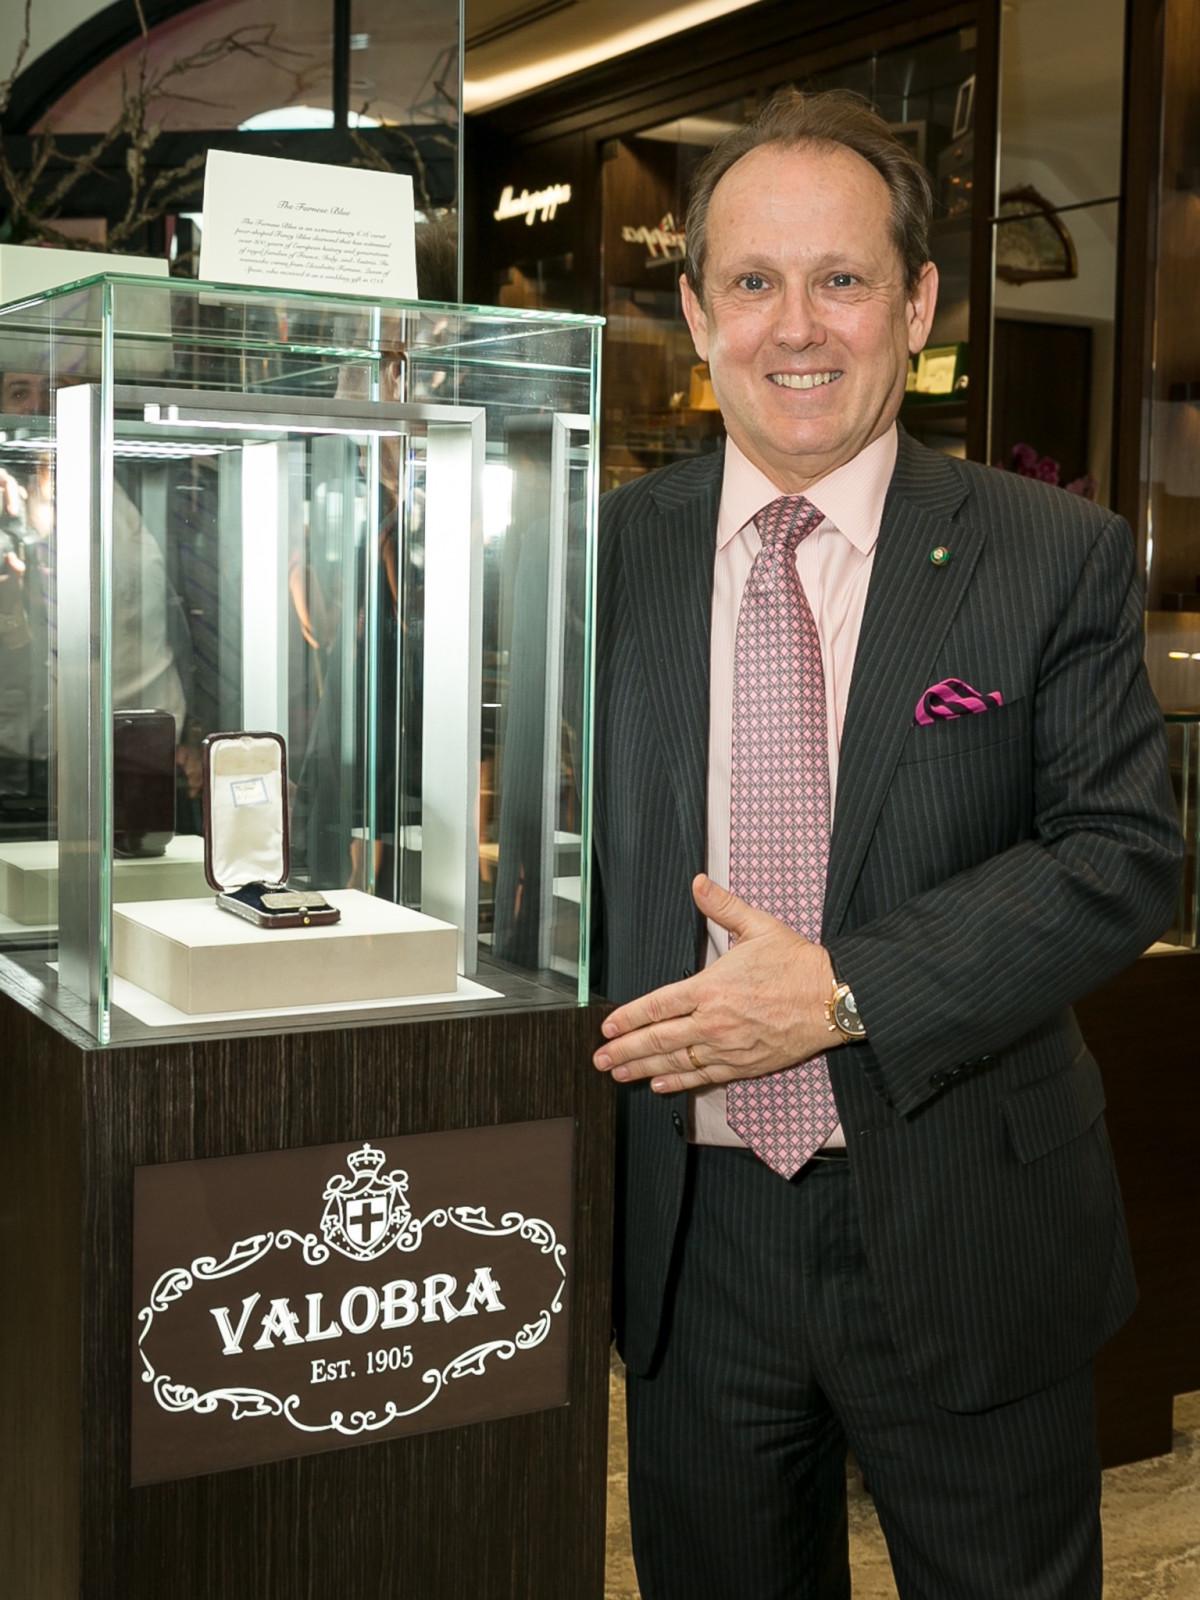 Valobra grand opening party Franco Valobra